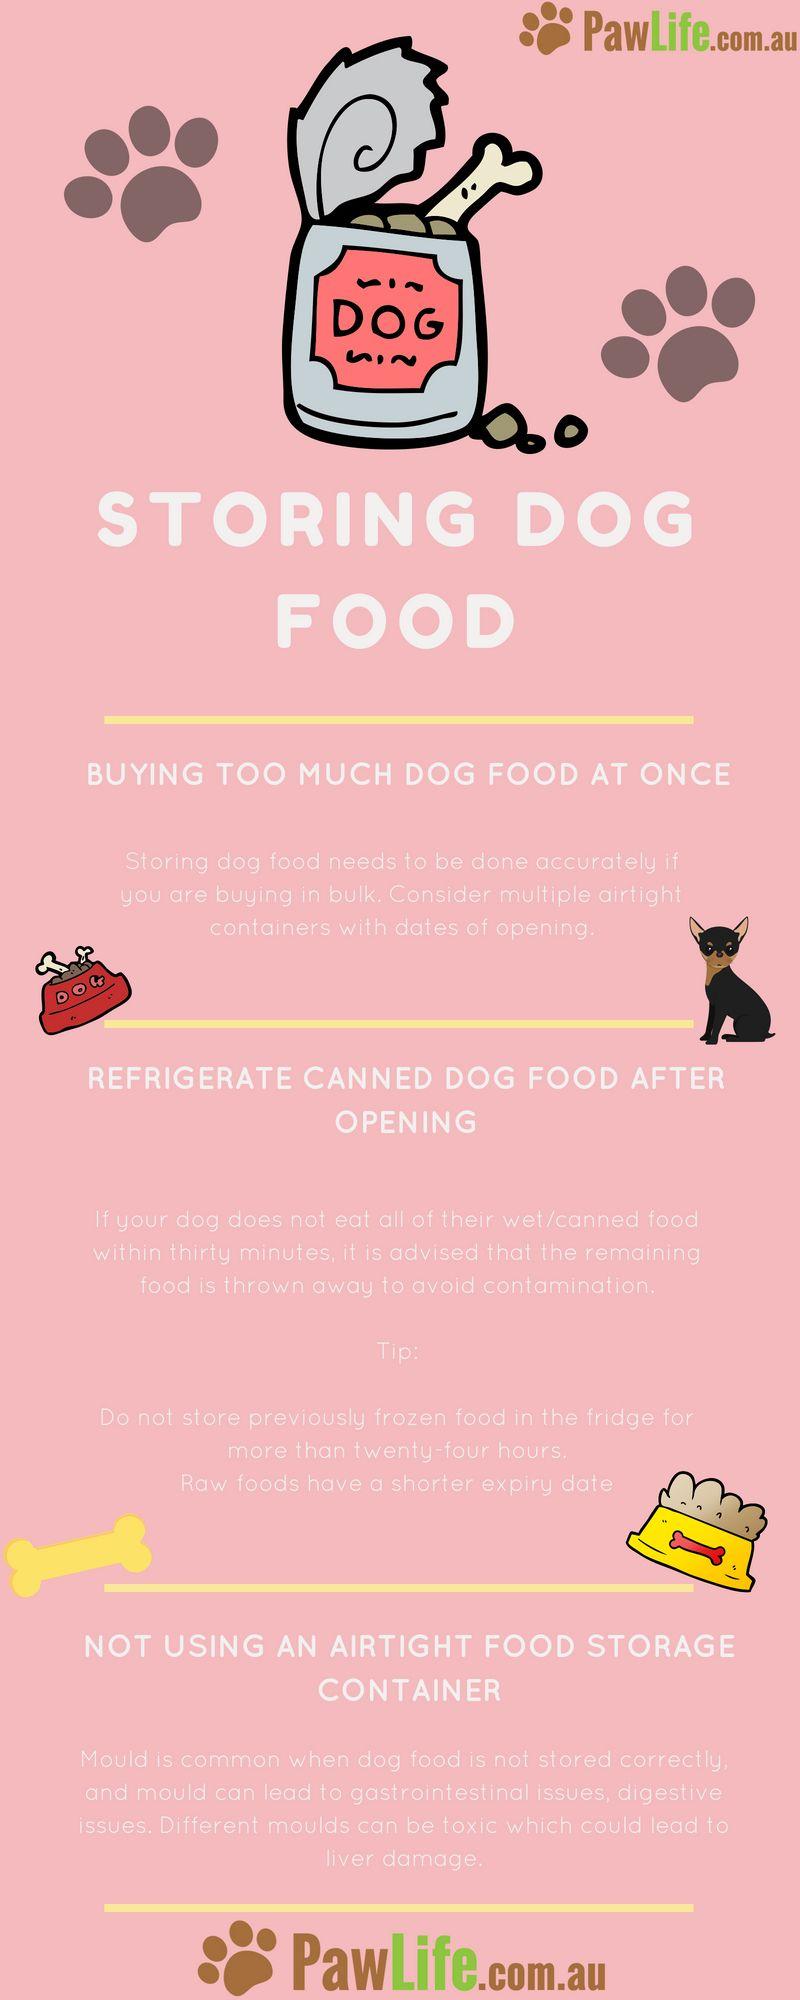 airtight dog food container australia